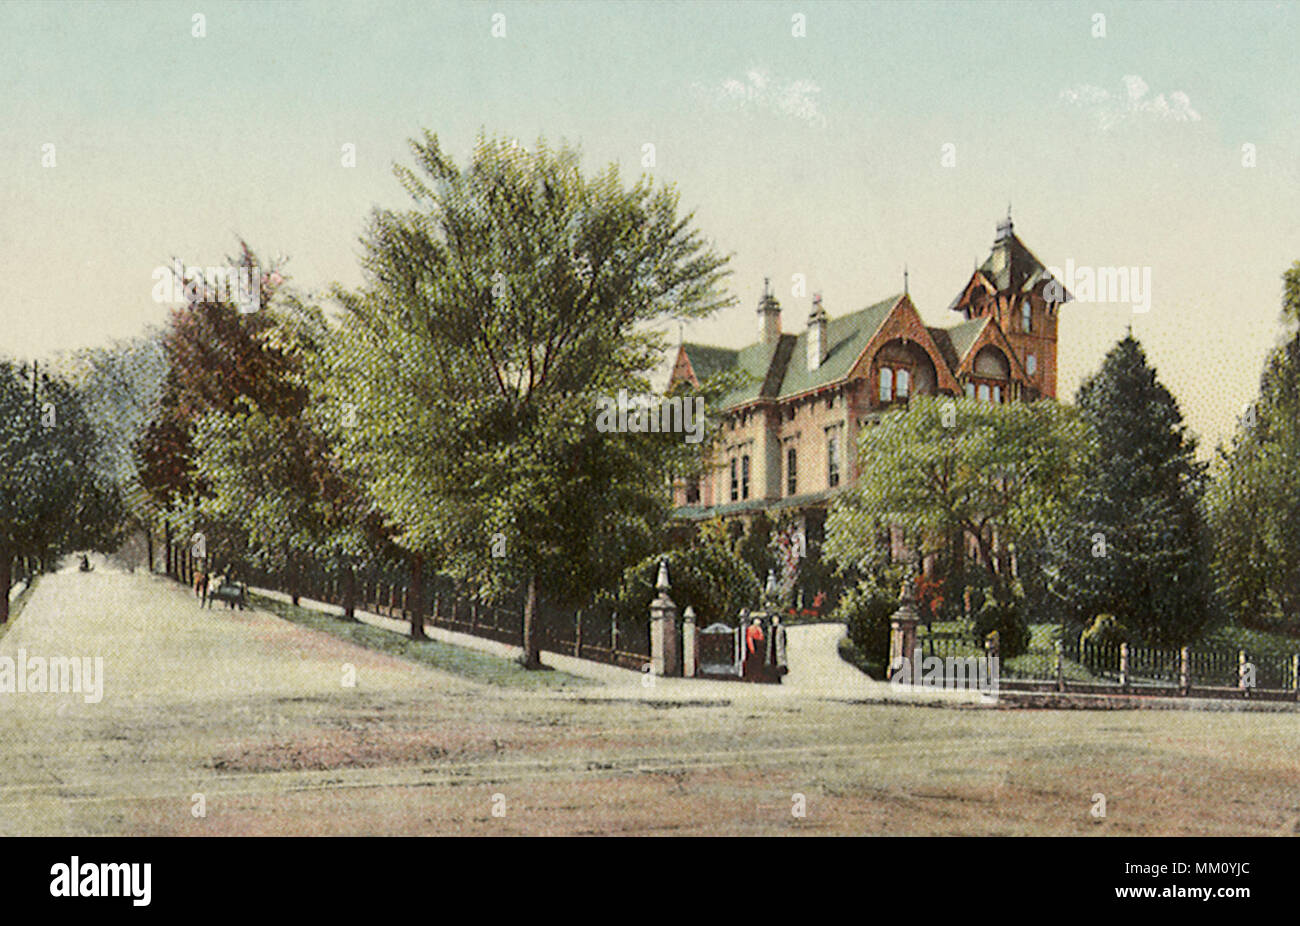 Dolph Residence. Portland. 1910 - Stock Image